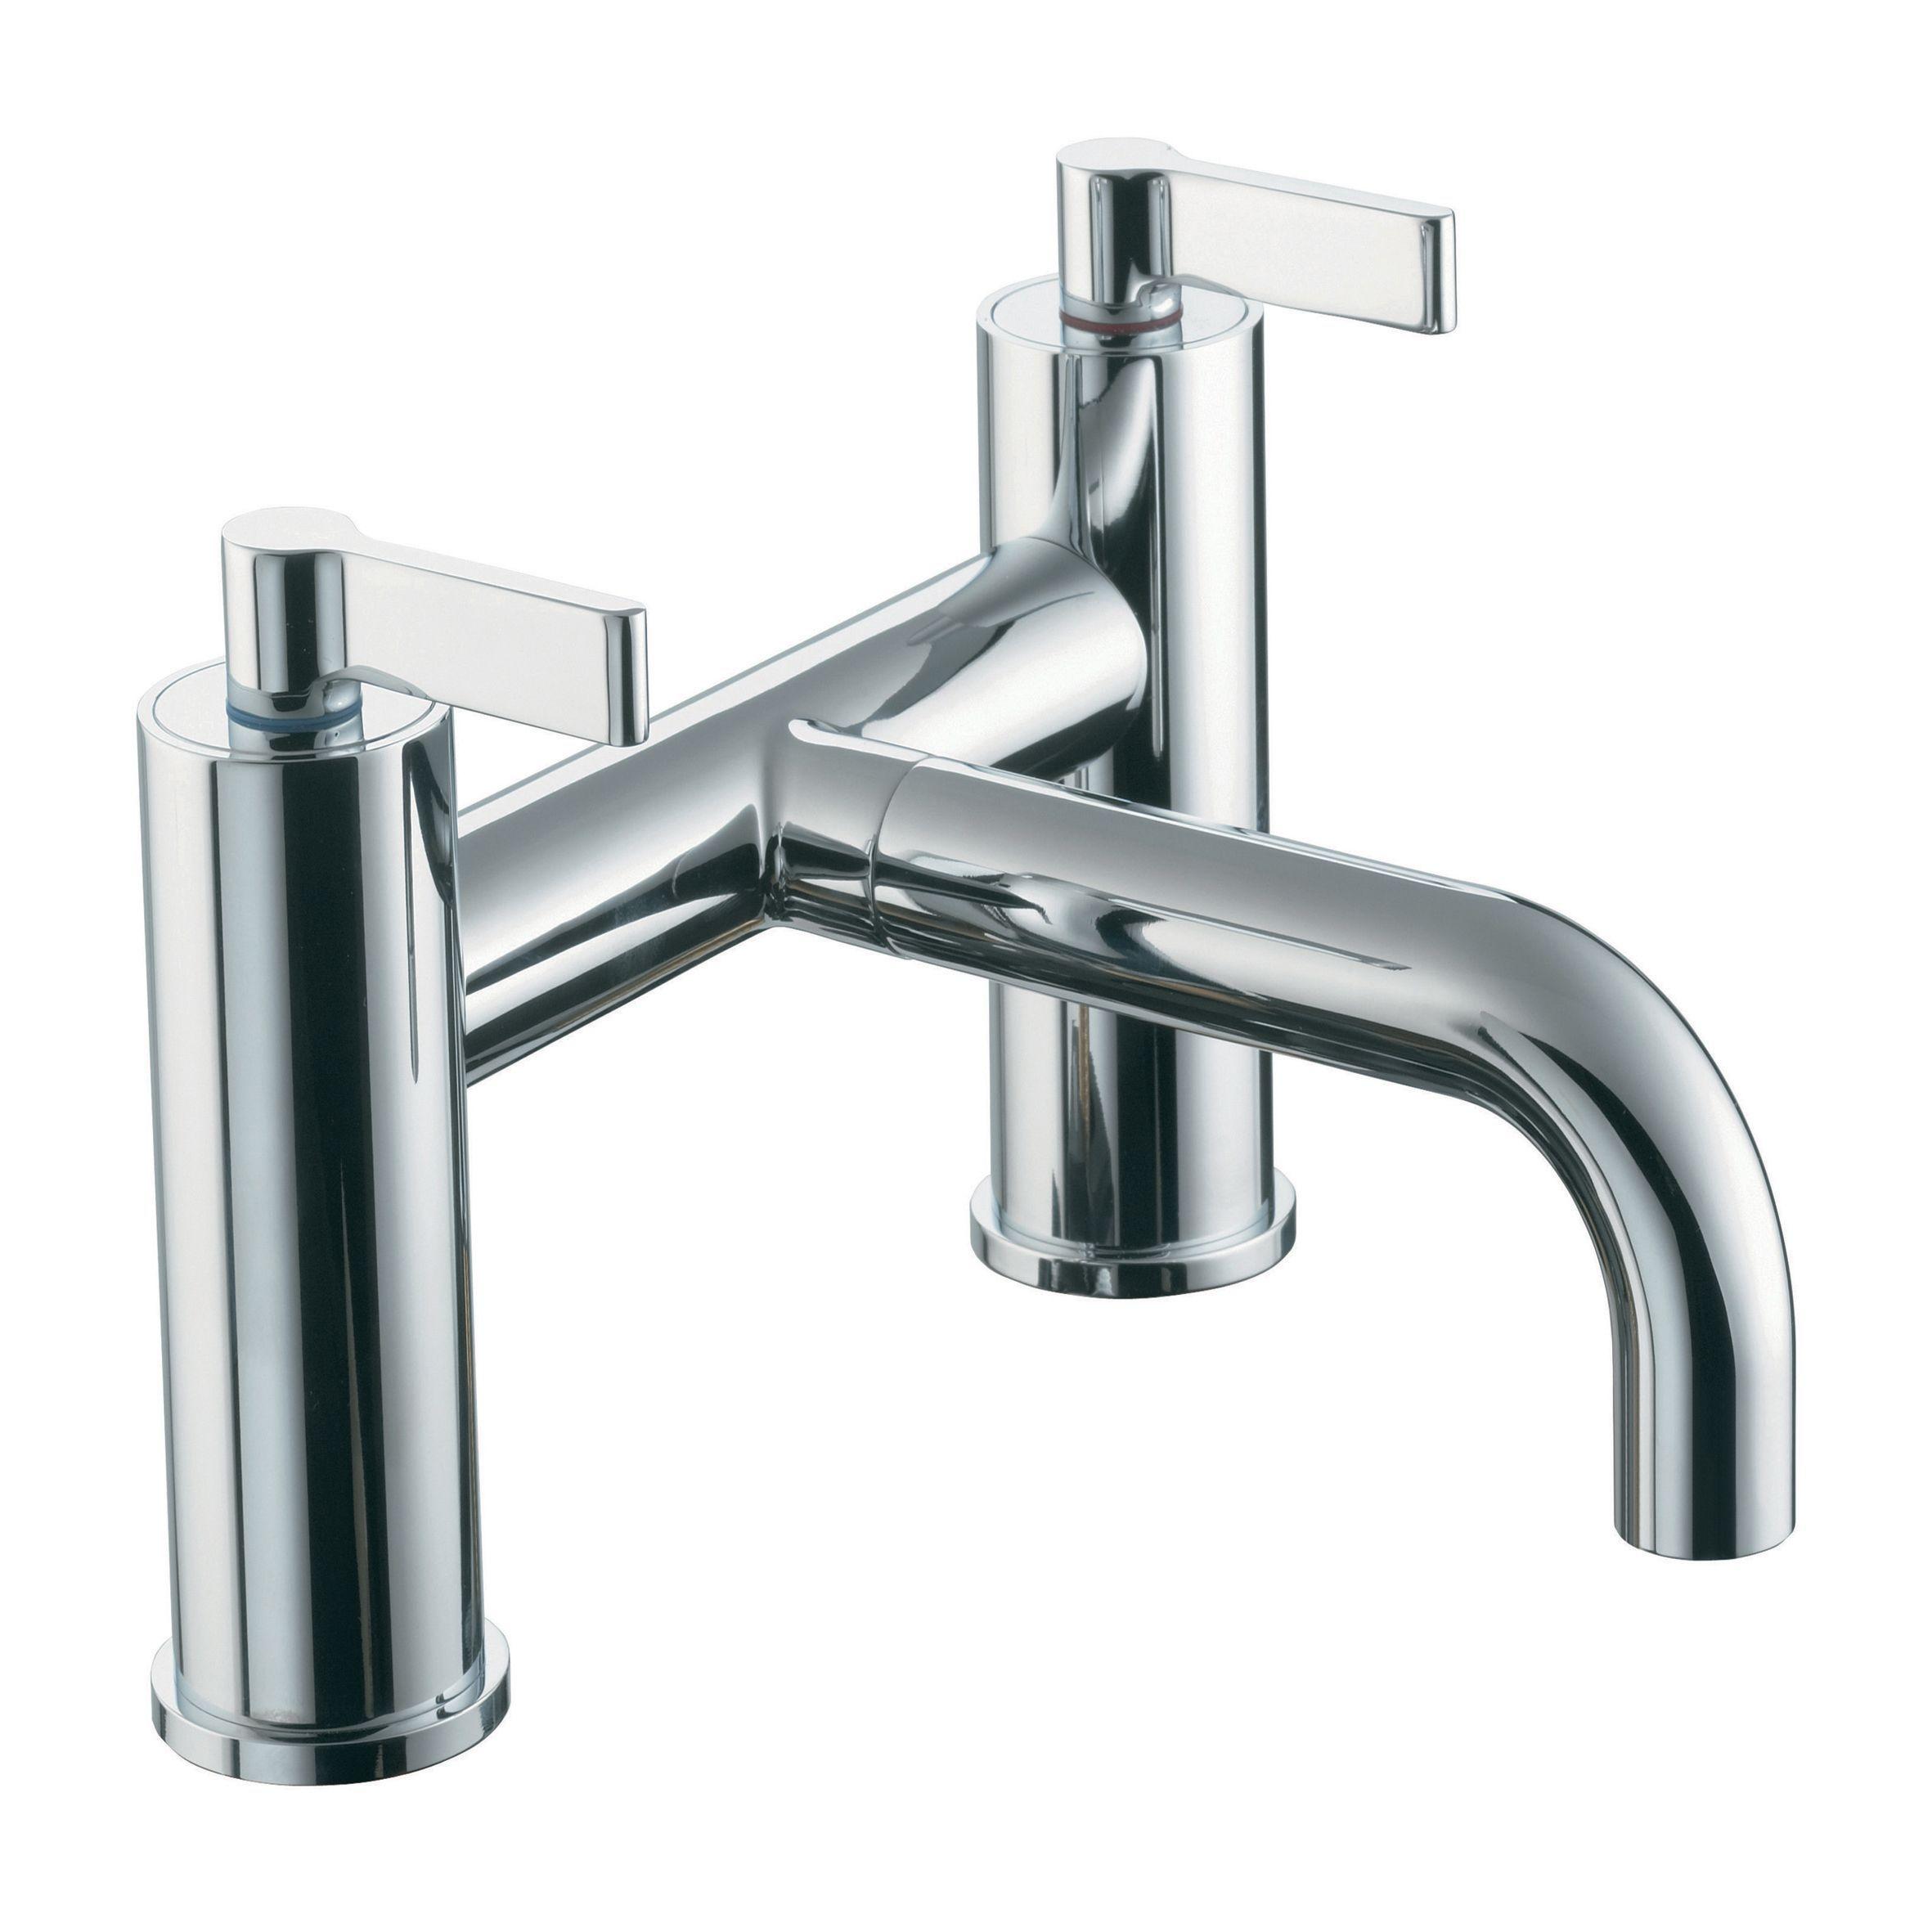 Ideal Standard Silver Chrome Bath Filler Tap Departments